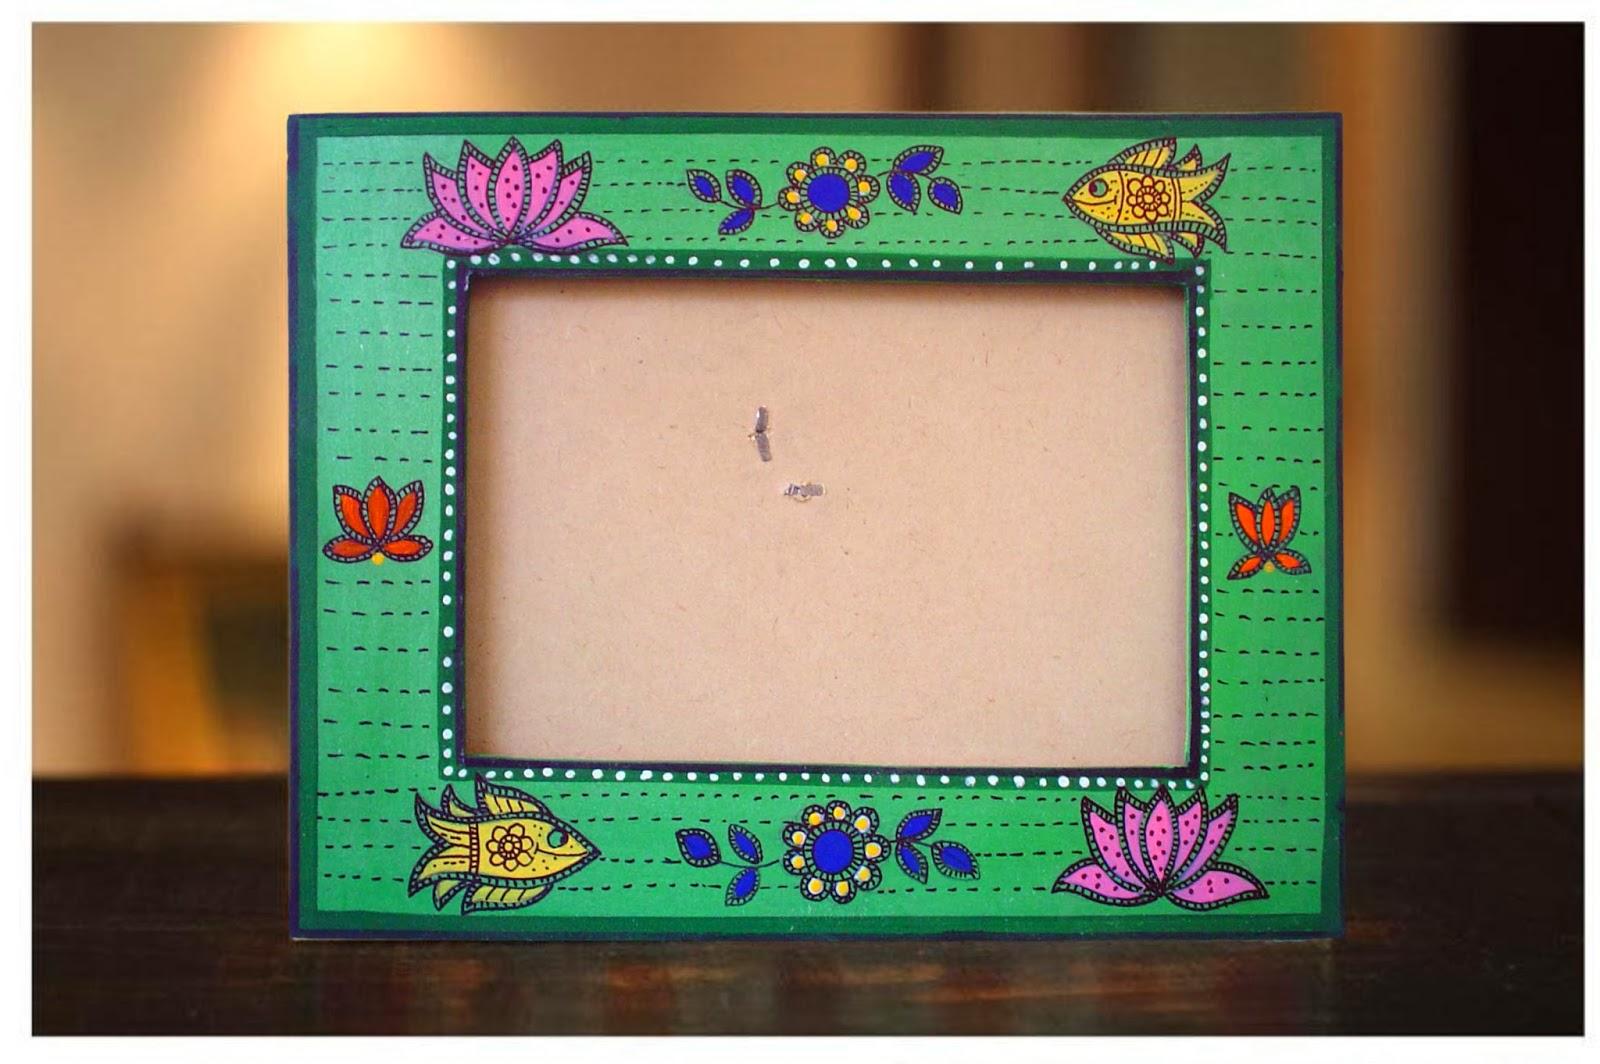 Fantastic do it yourself craft kits by the jaipur craft kit madhubani photo frame kit solutioingenieria Choice Image